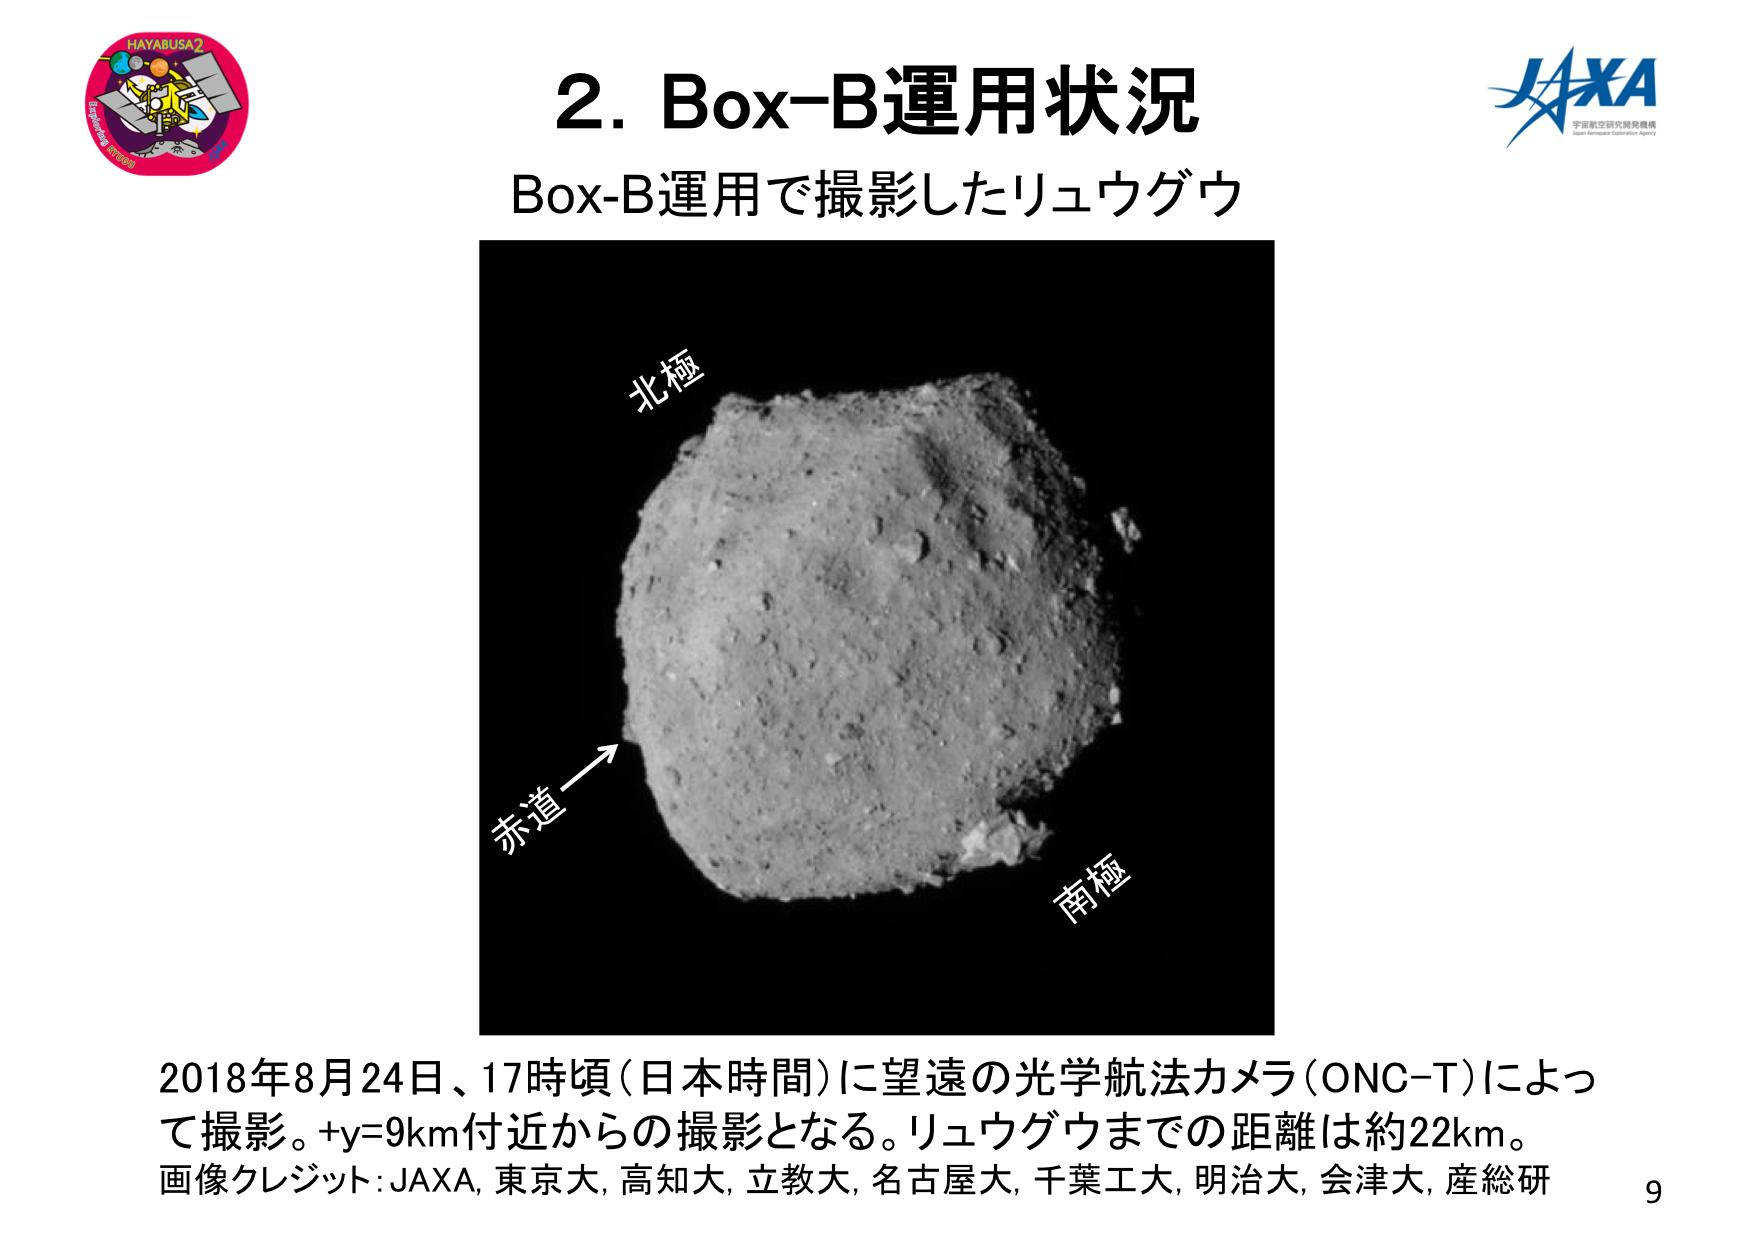 f:id:Imamura:20180905231941p:plain